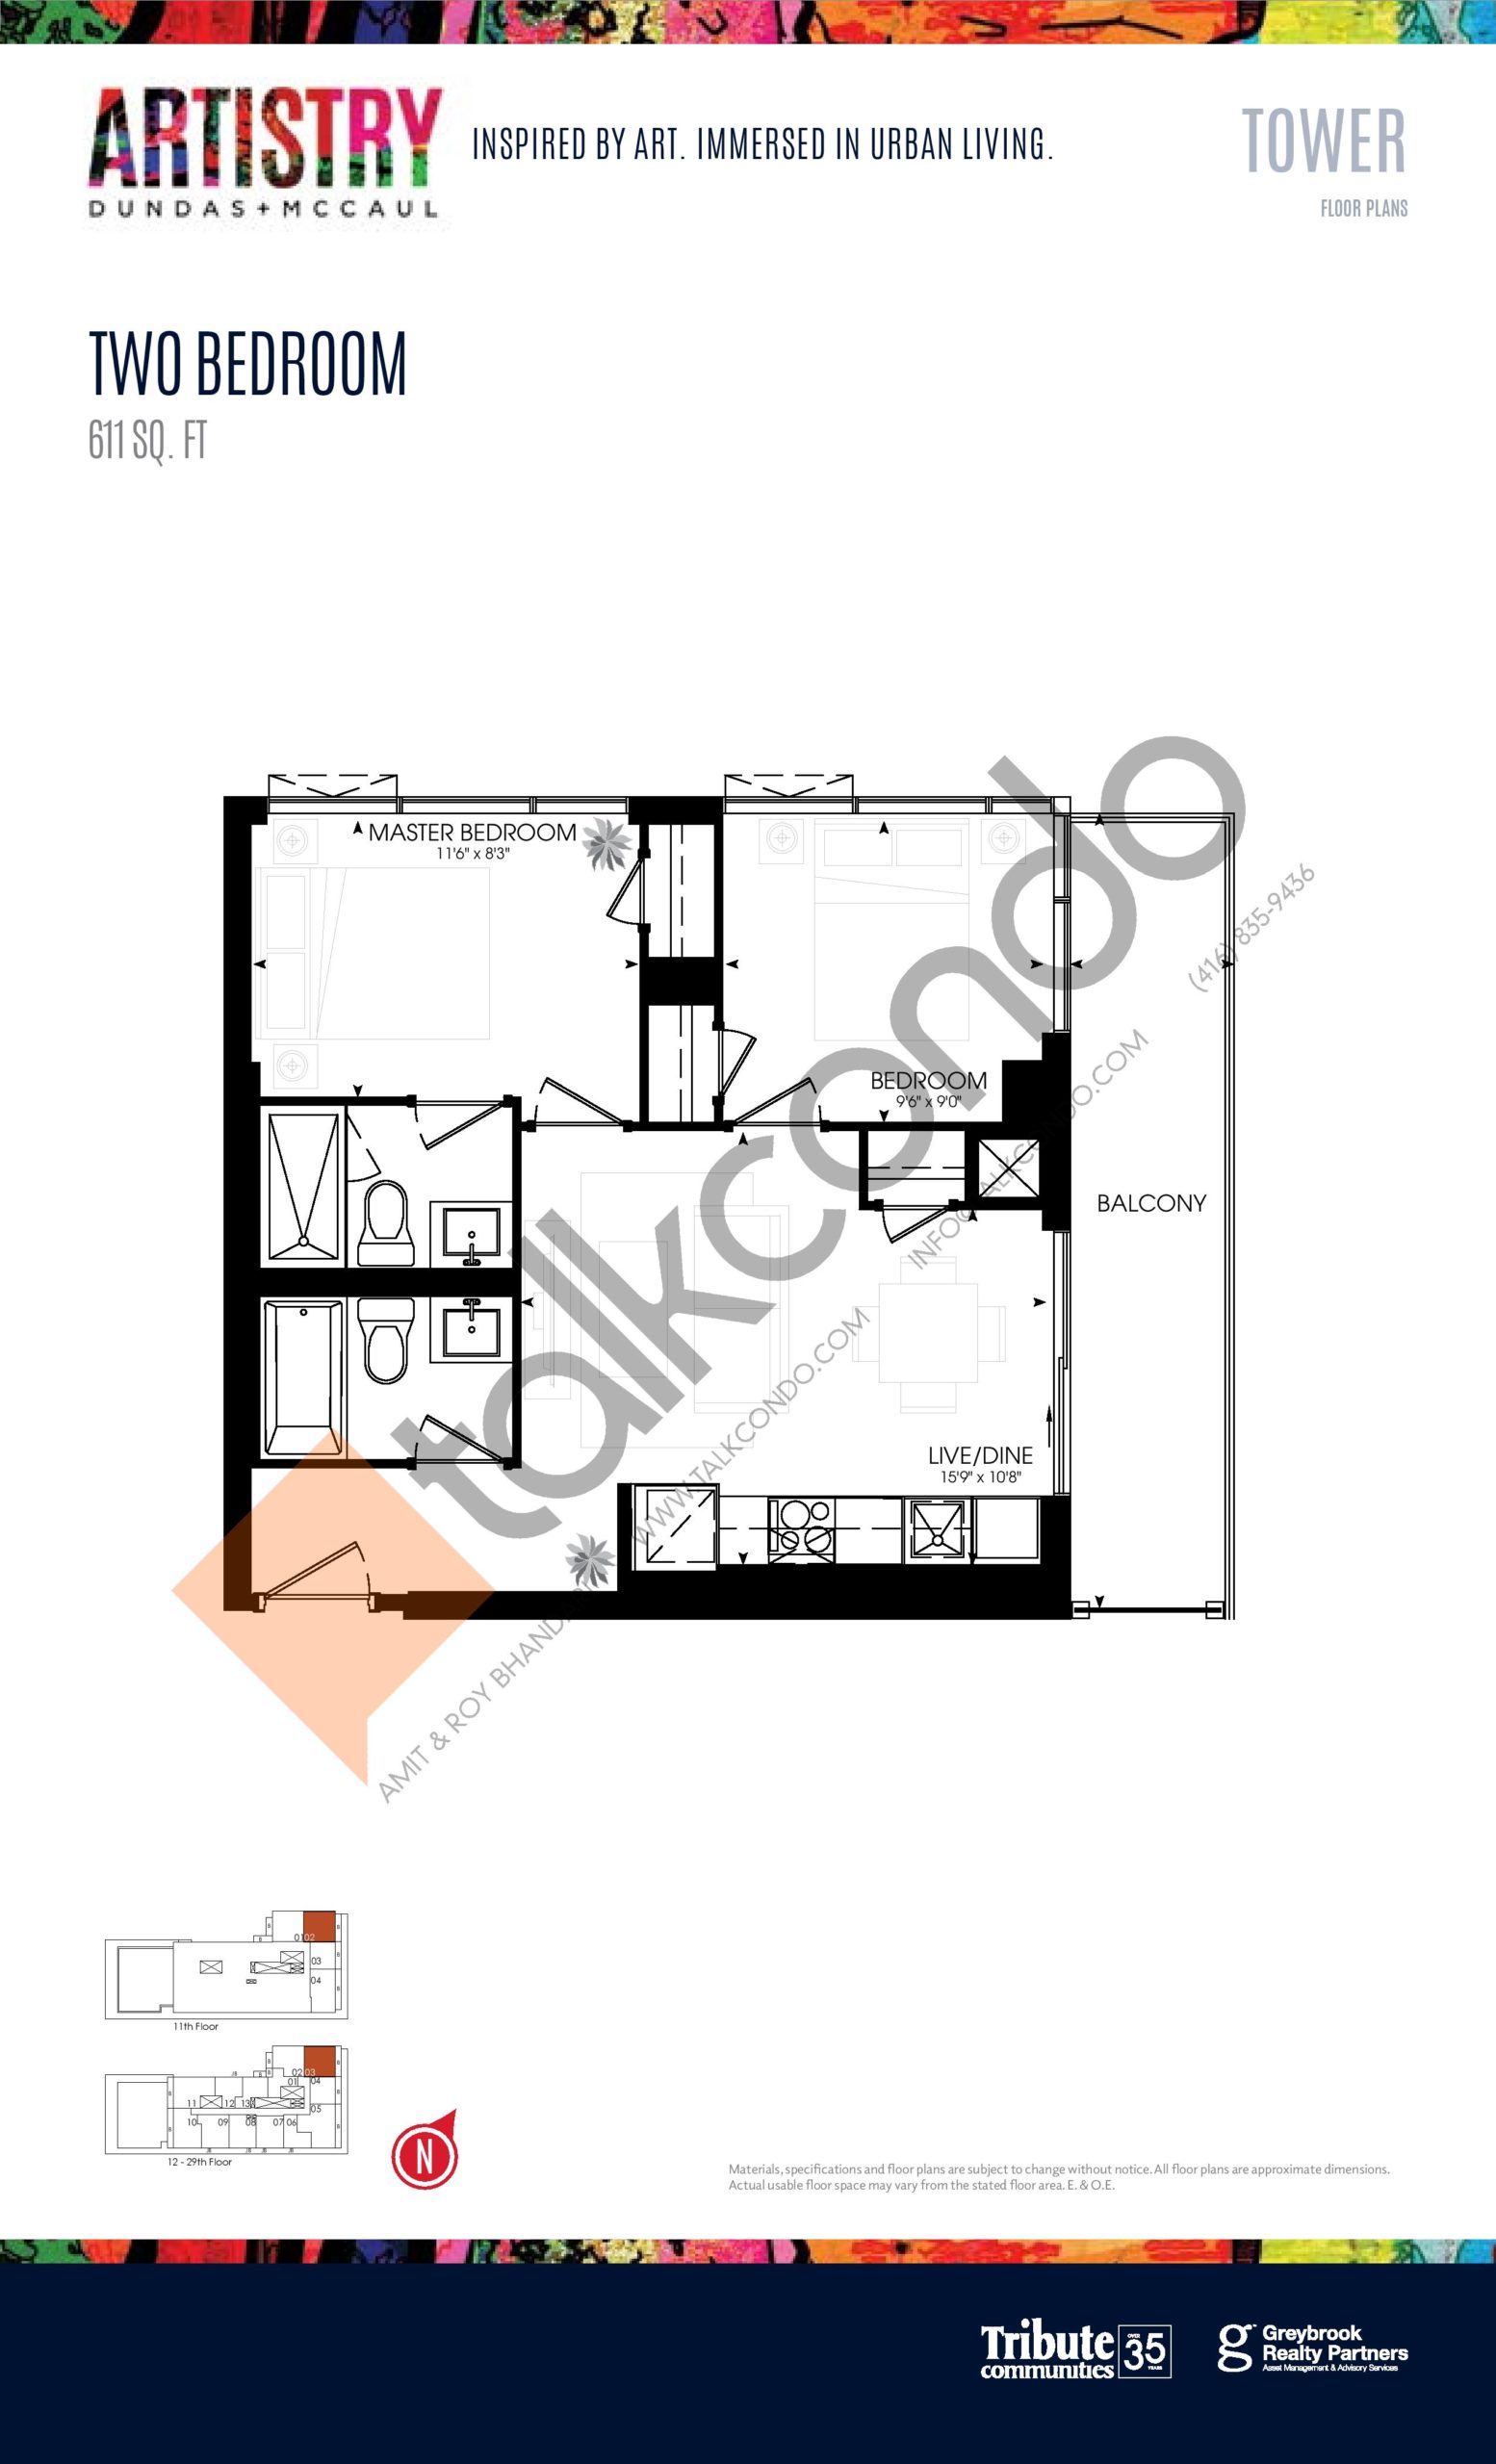 611 sq. ft. - Tower Floor Plan at Artistry Condos - 611 sq.ft